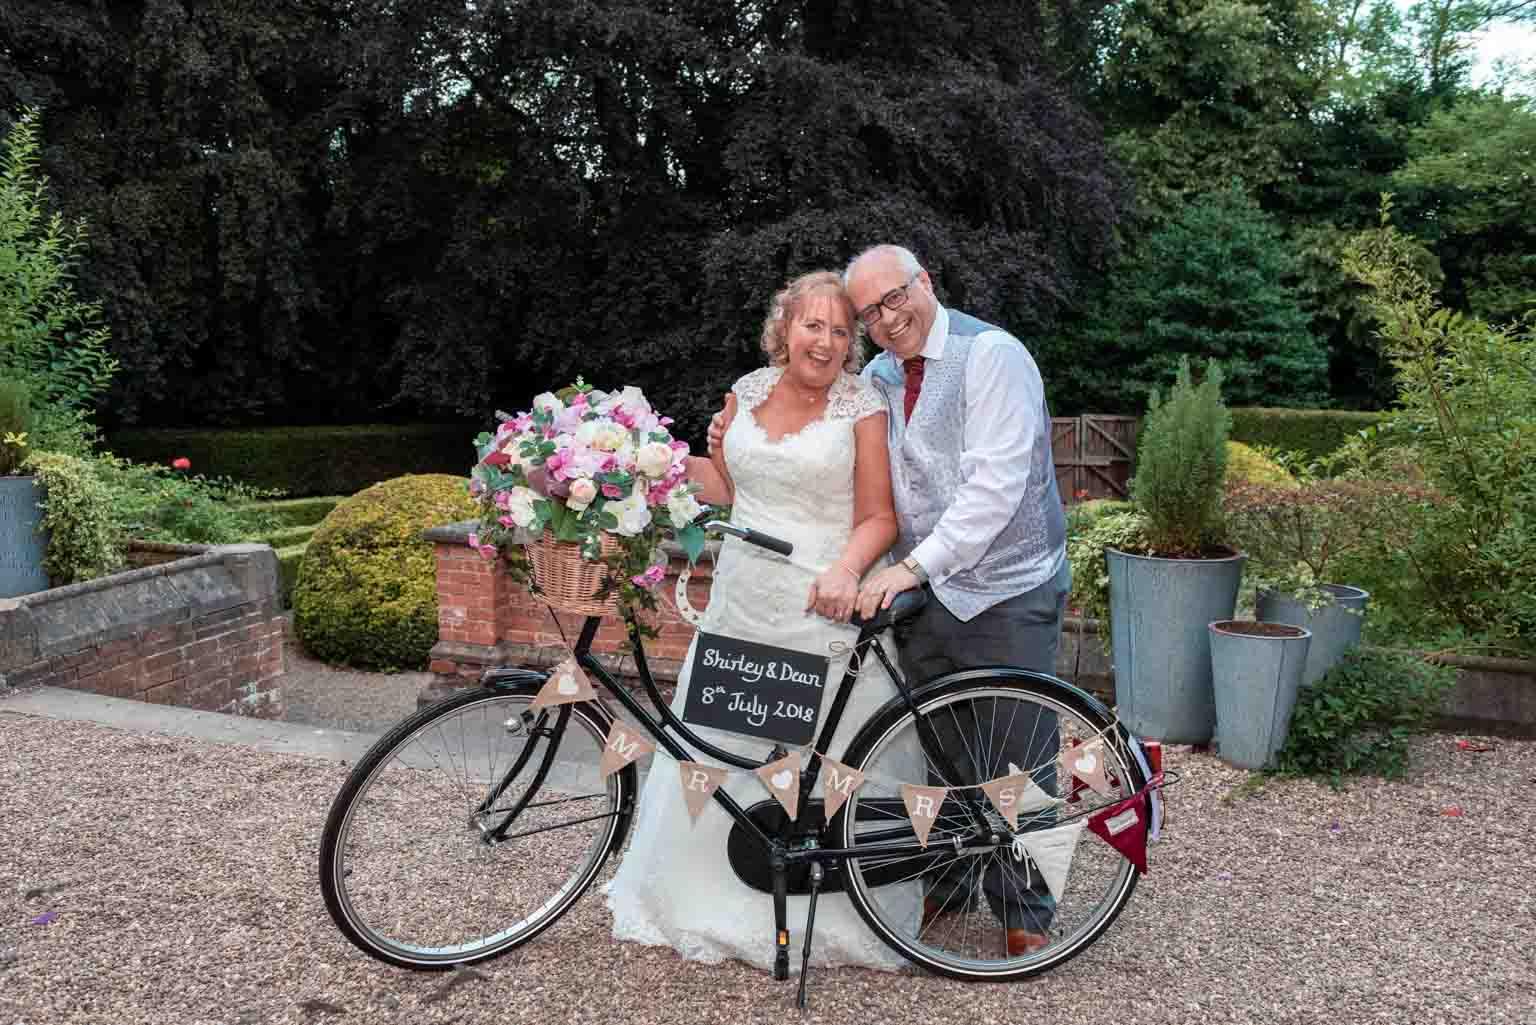 Nottingham's Best Wedding Photographer?